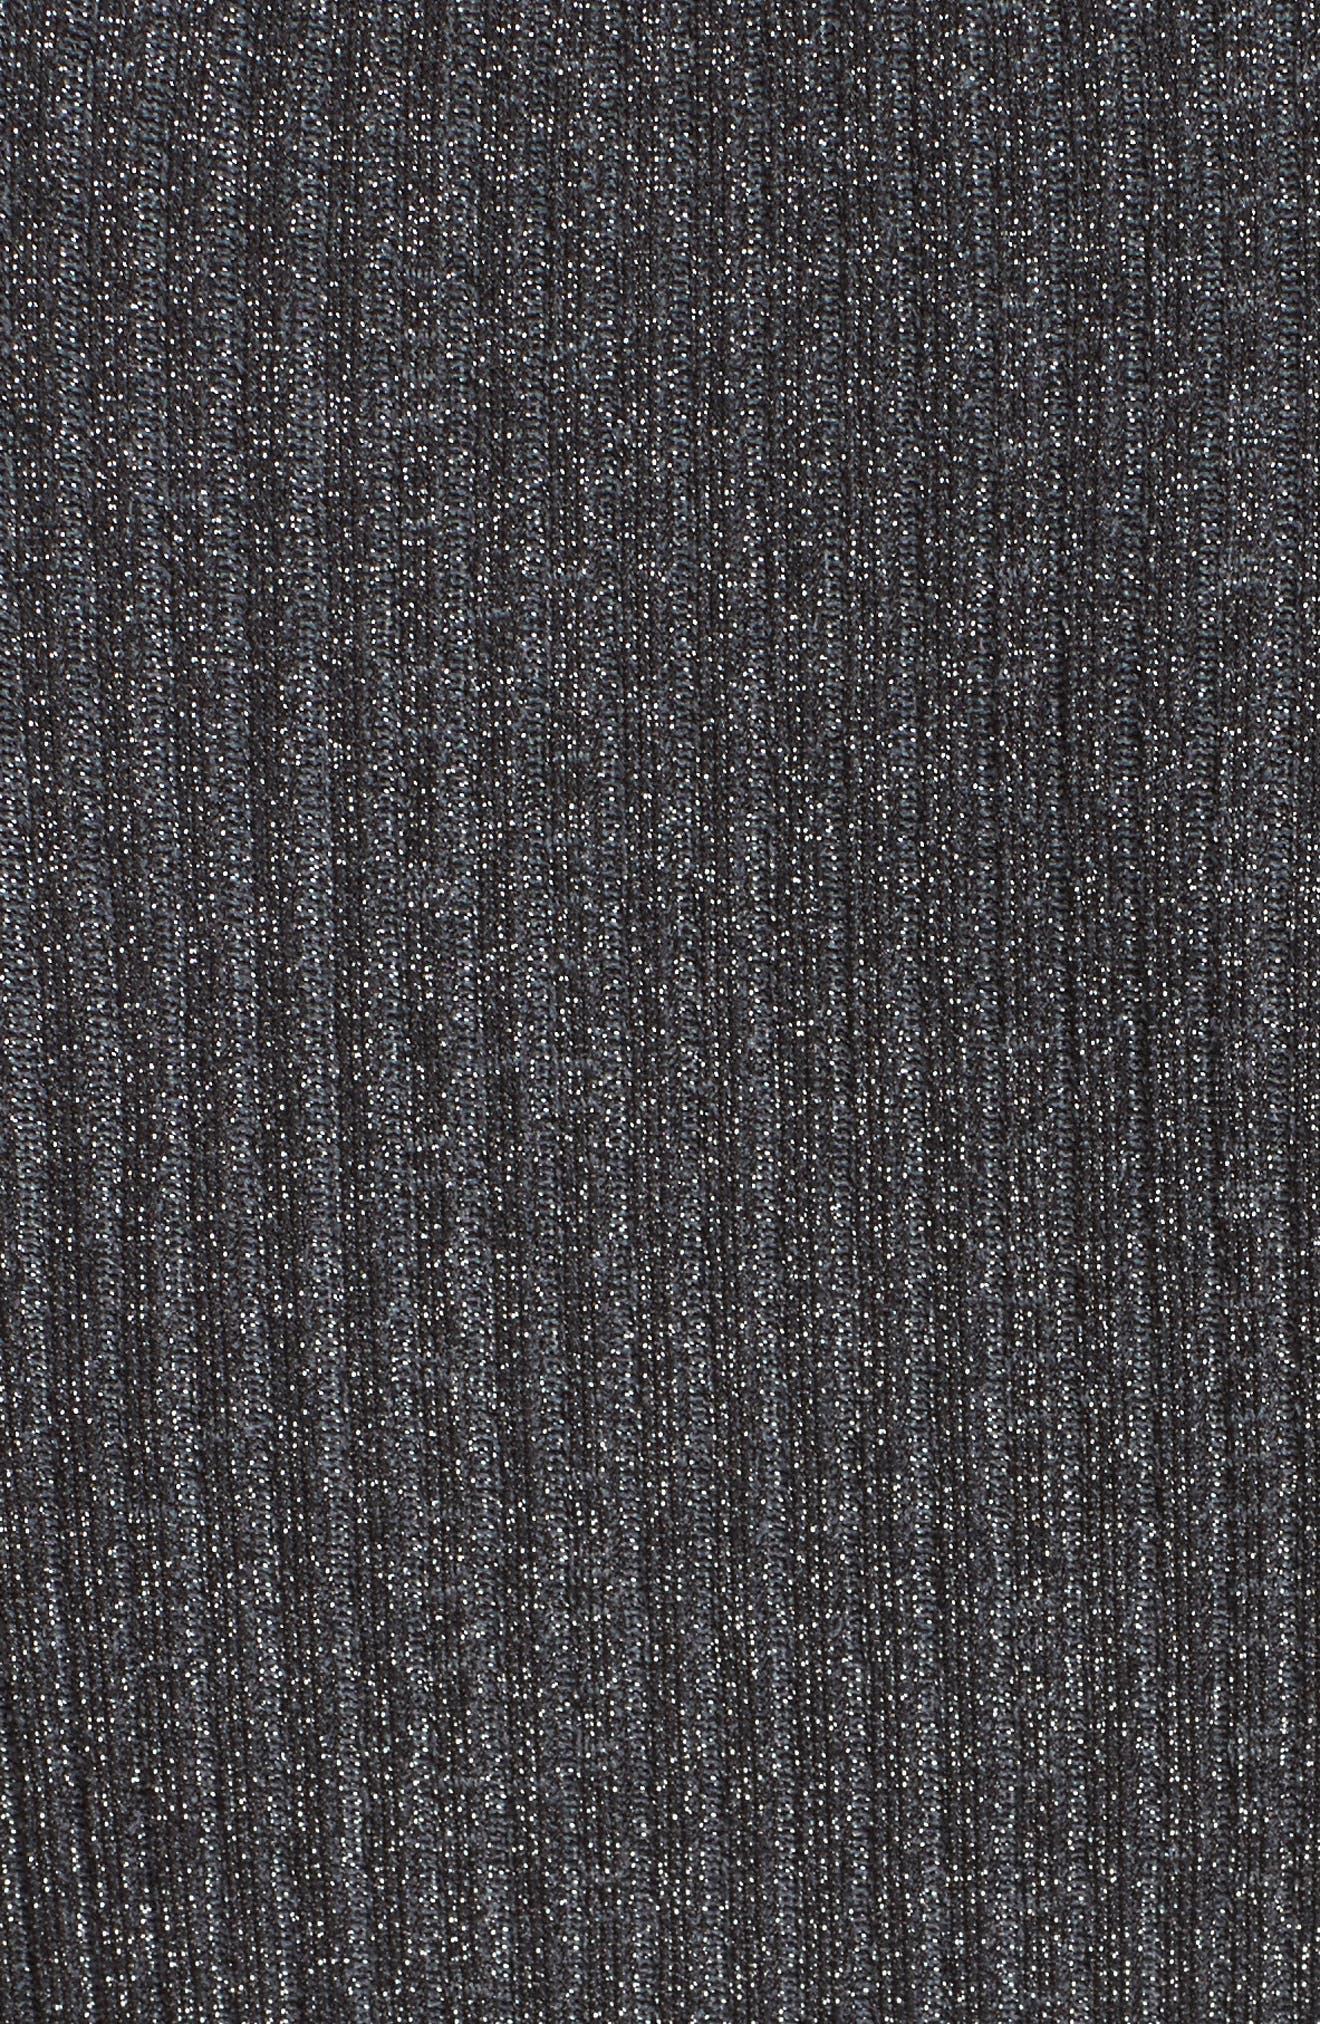 Stardust Rib Knit Sheath Dress,                             Alternate thumbnail 5, color,                             022